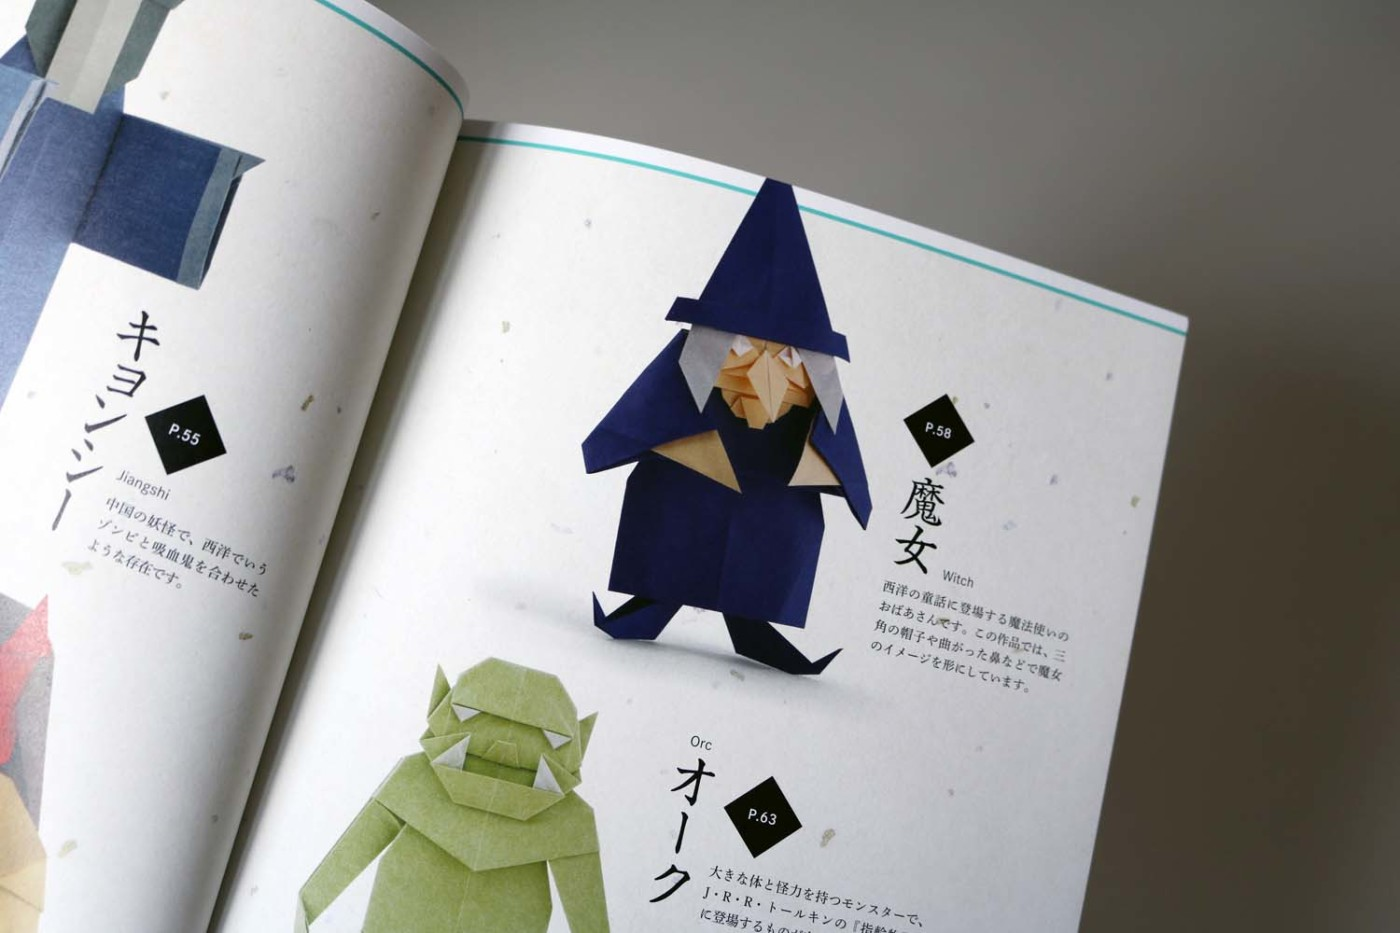 9 Tailed Fox Origami (TUTORIAL) 2/2 Designed by Sarjigami - YouTube | 933x1400